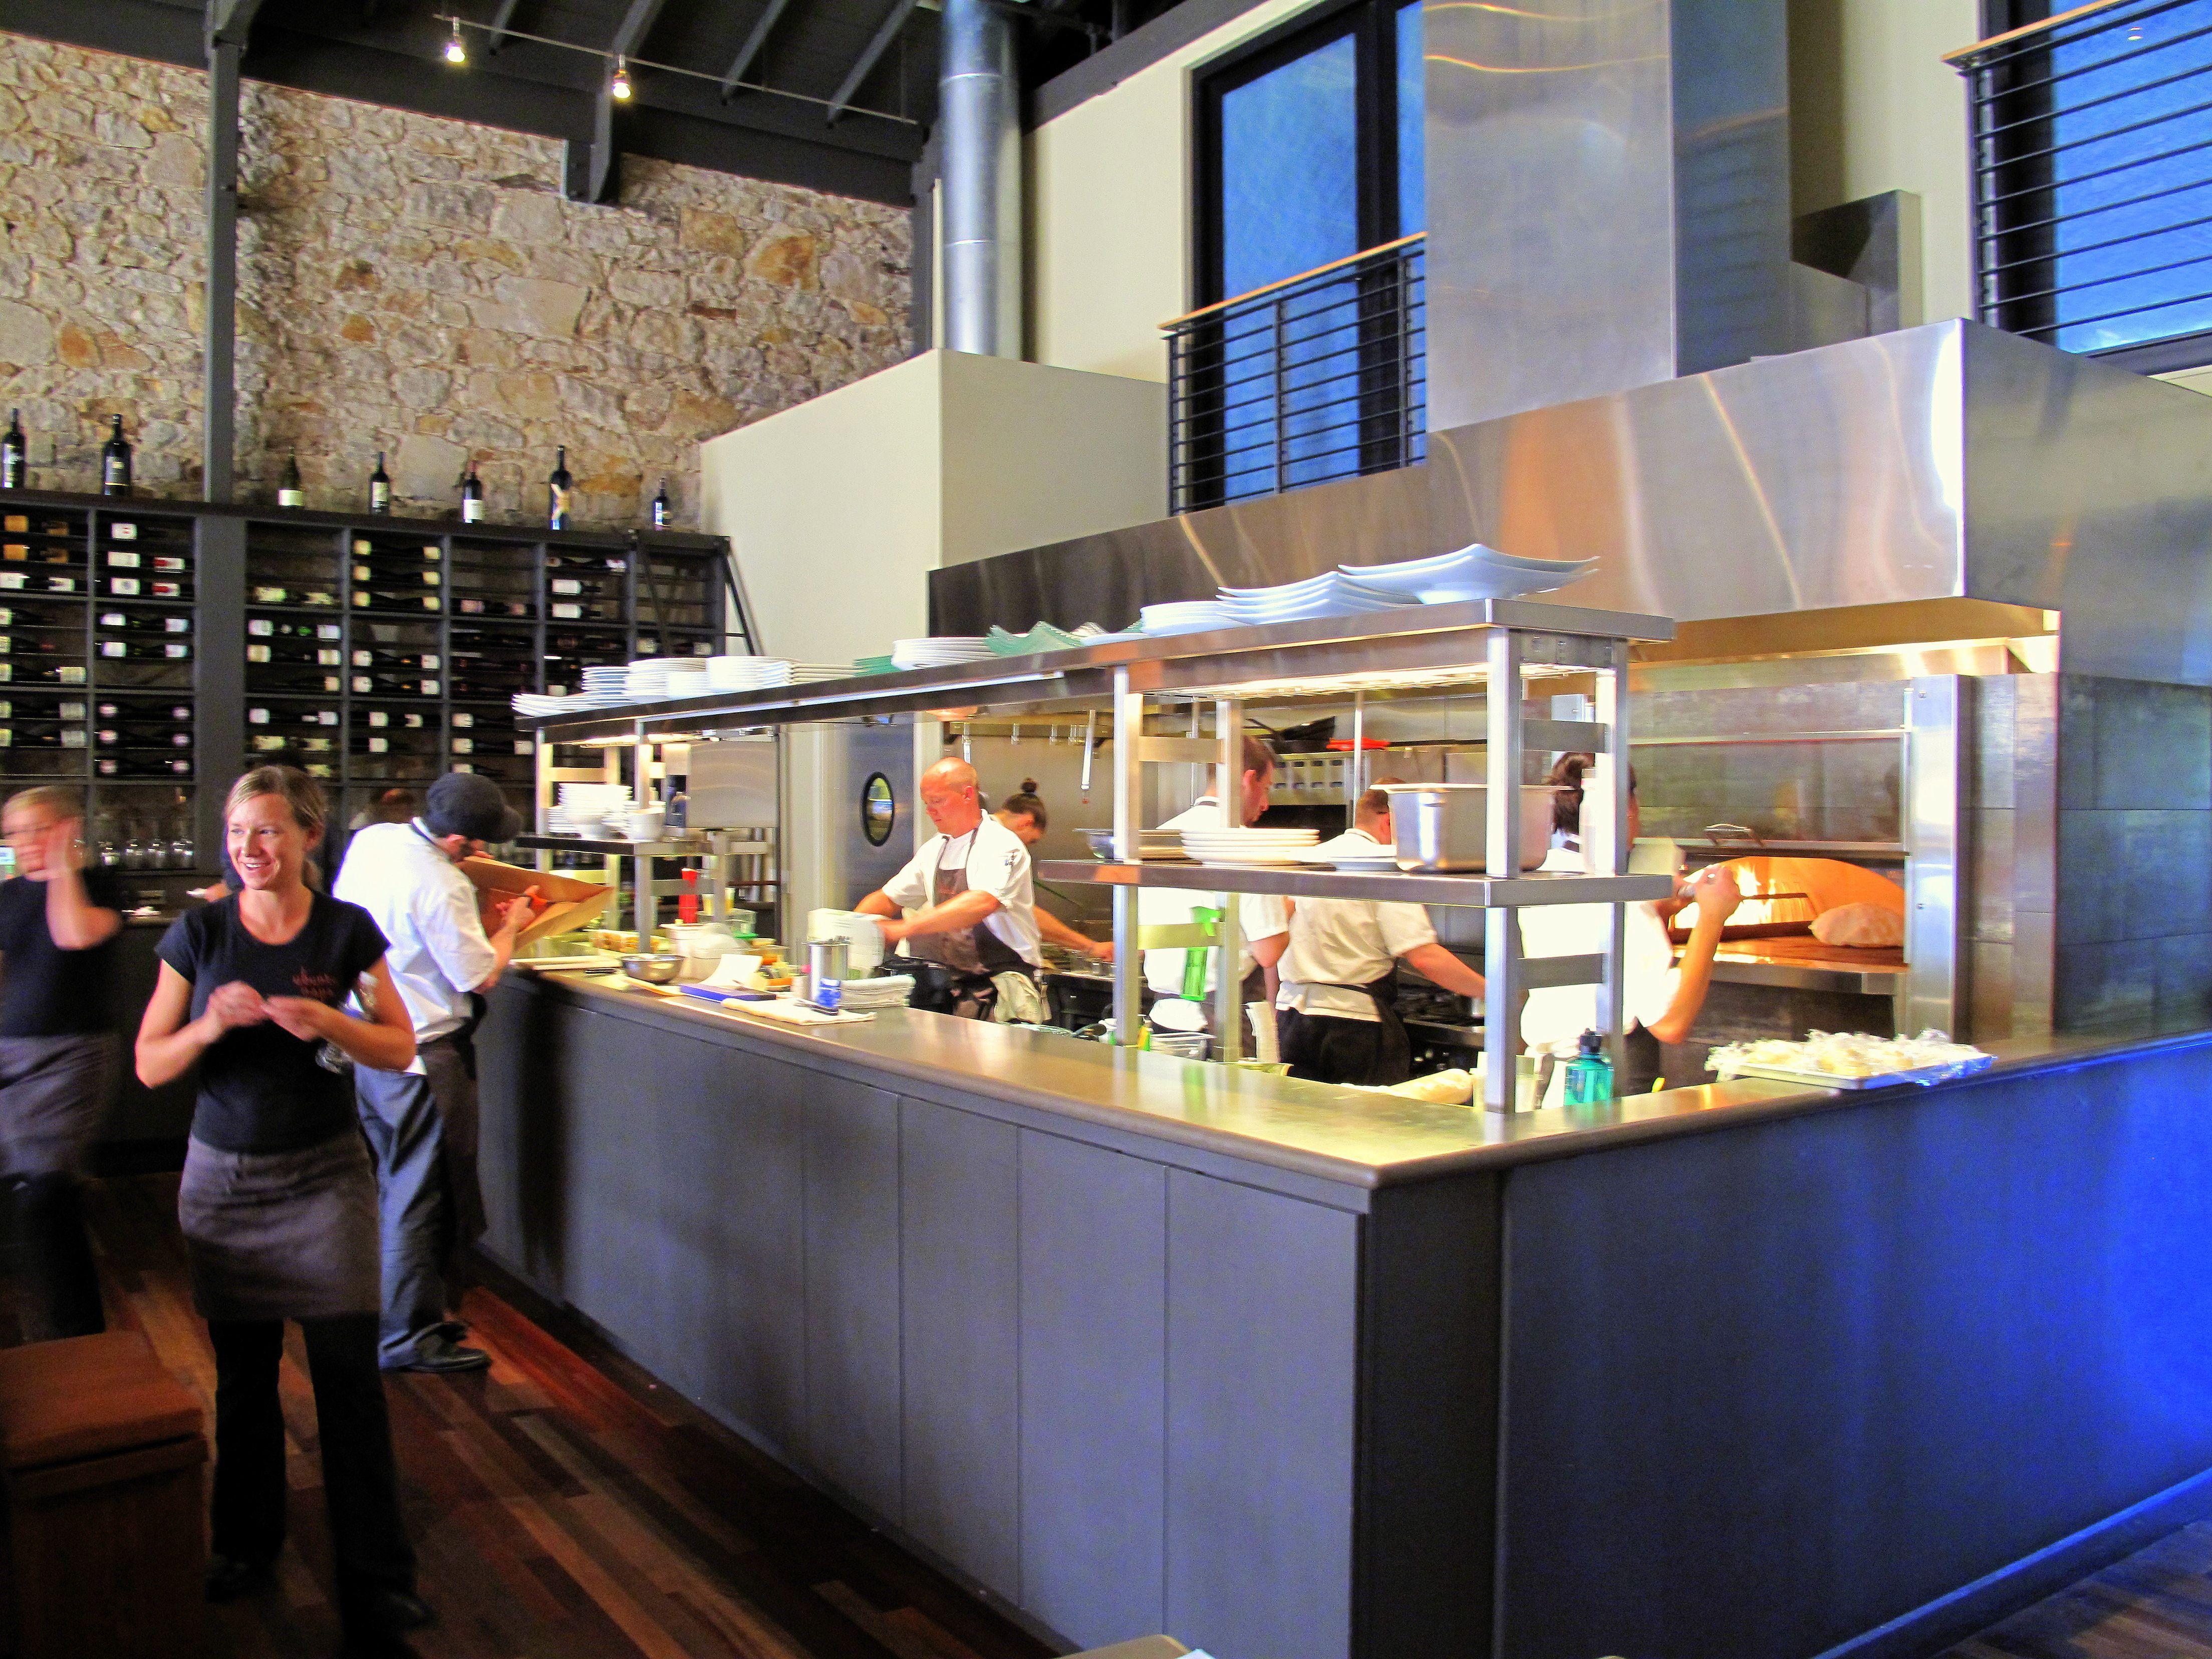 Ubuntu Napa Restaurant Open Kitchen Restaurant Simple Kitchen